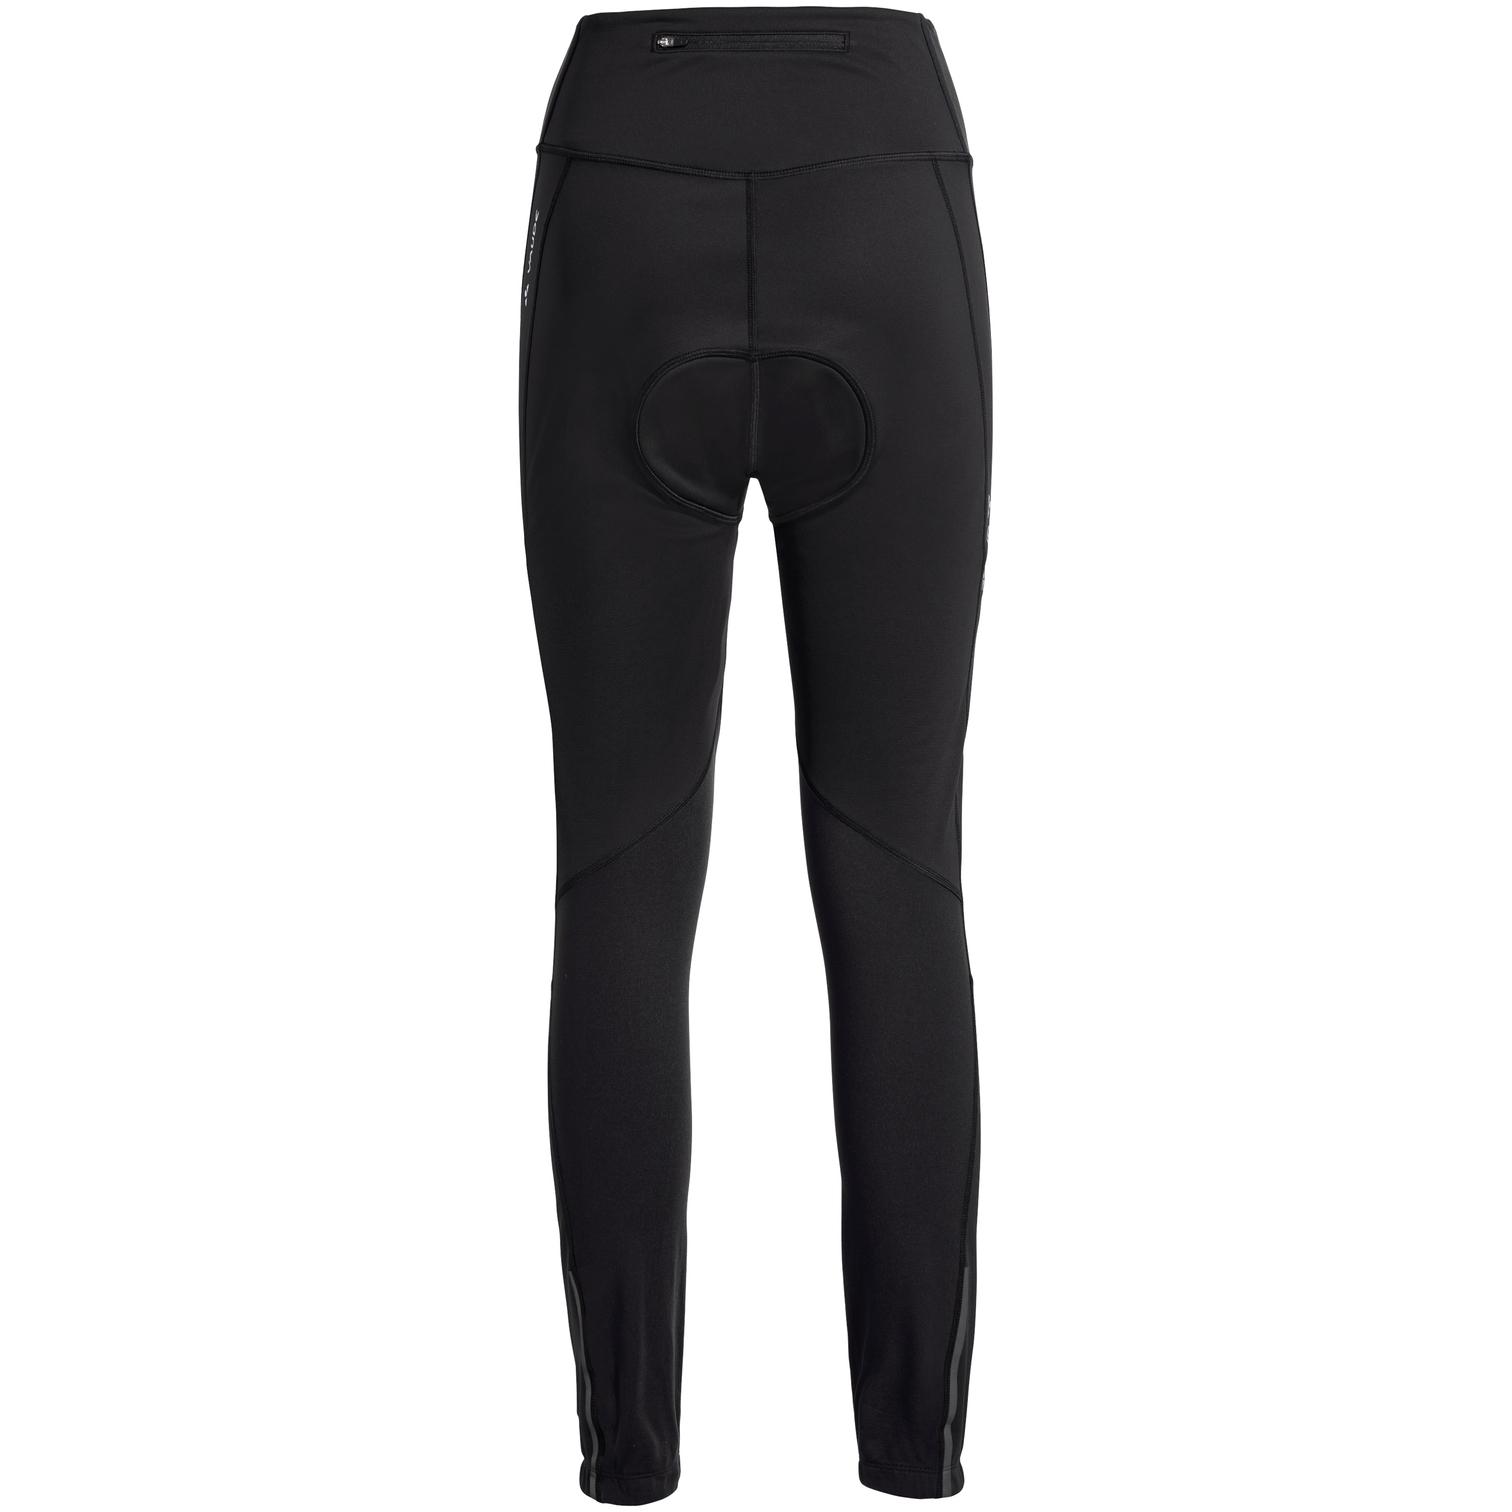 Image of Vaude Women's Posta Warm Tights - black